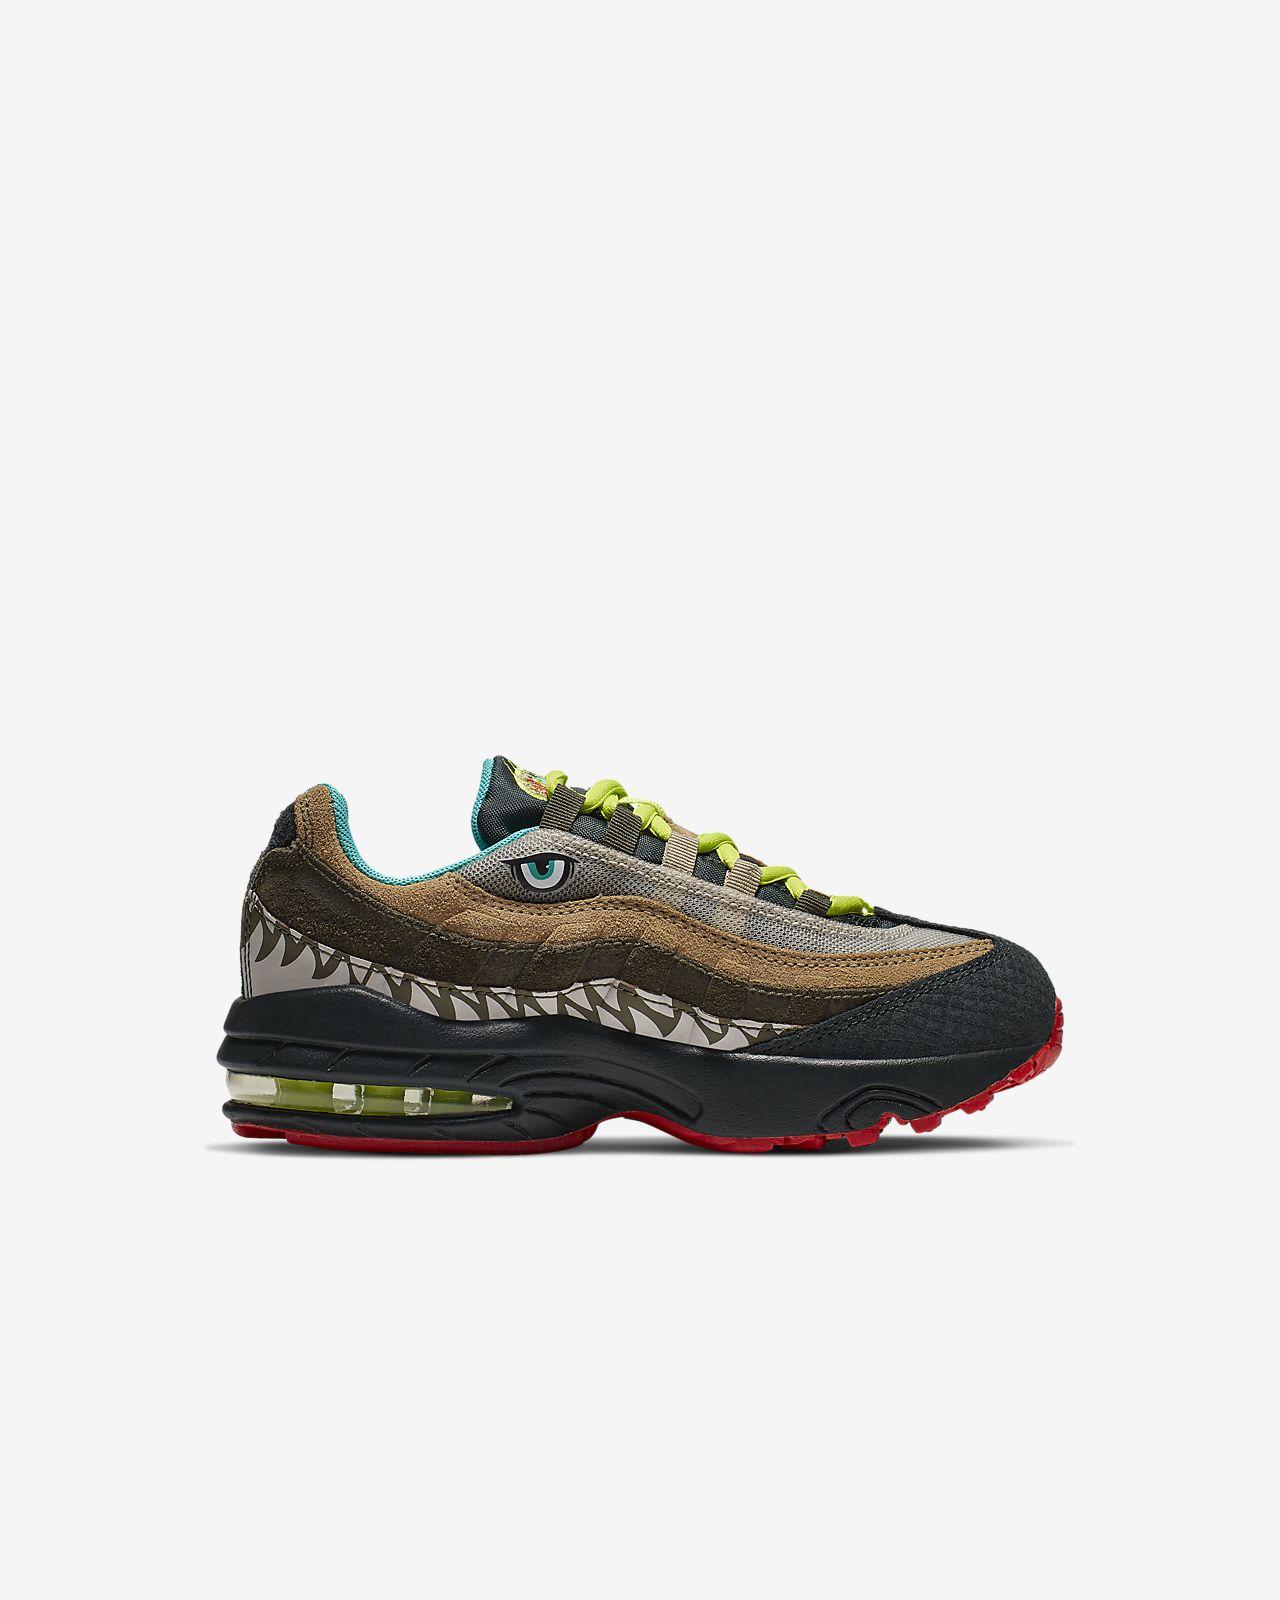 best cheap 25a42 cff8c ... Nike Air Max 95 Little Kids  Shoe